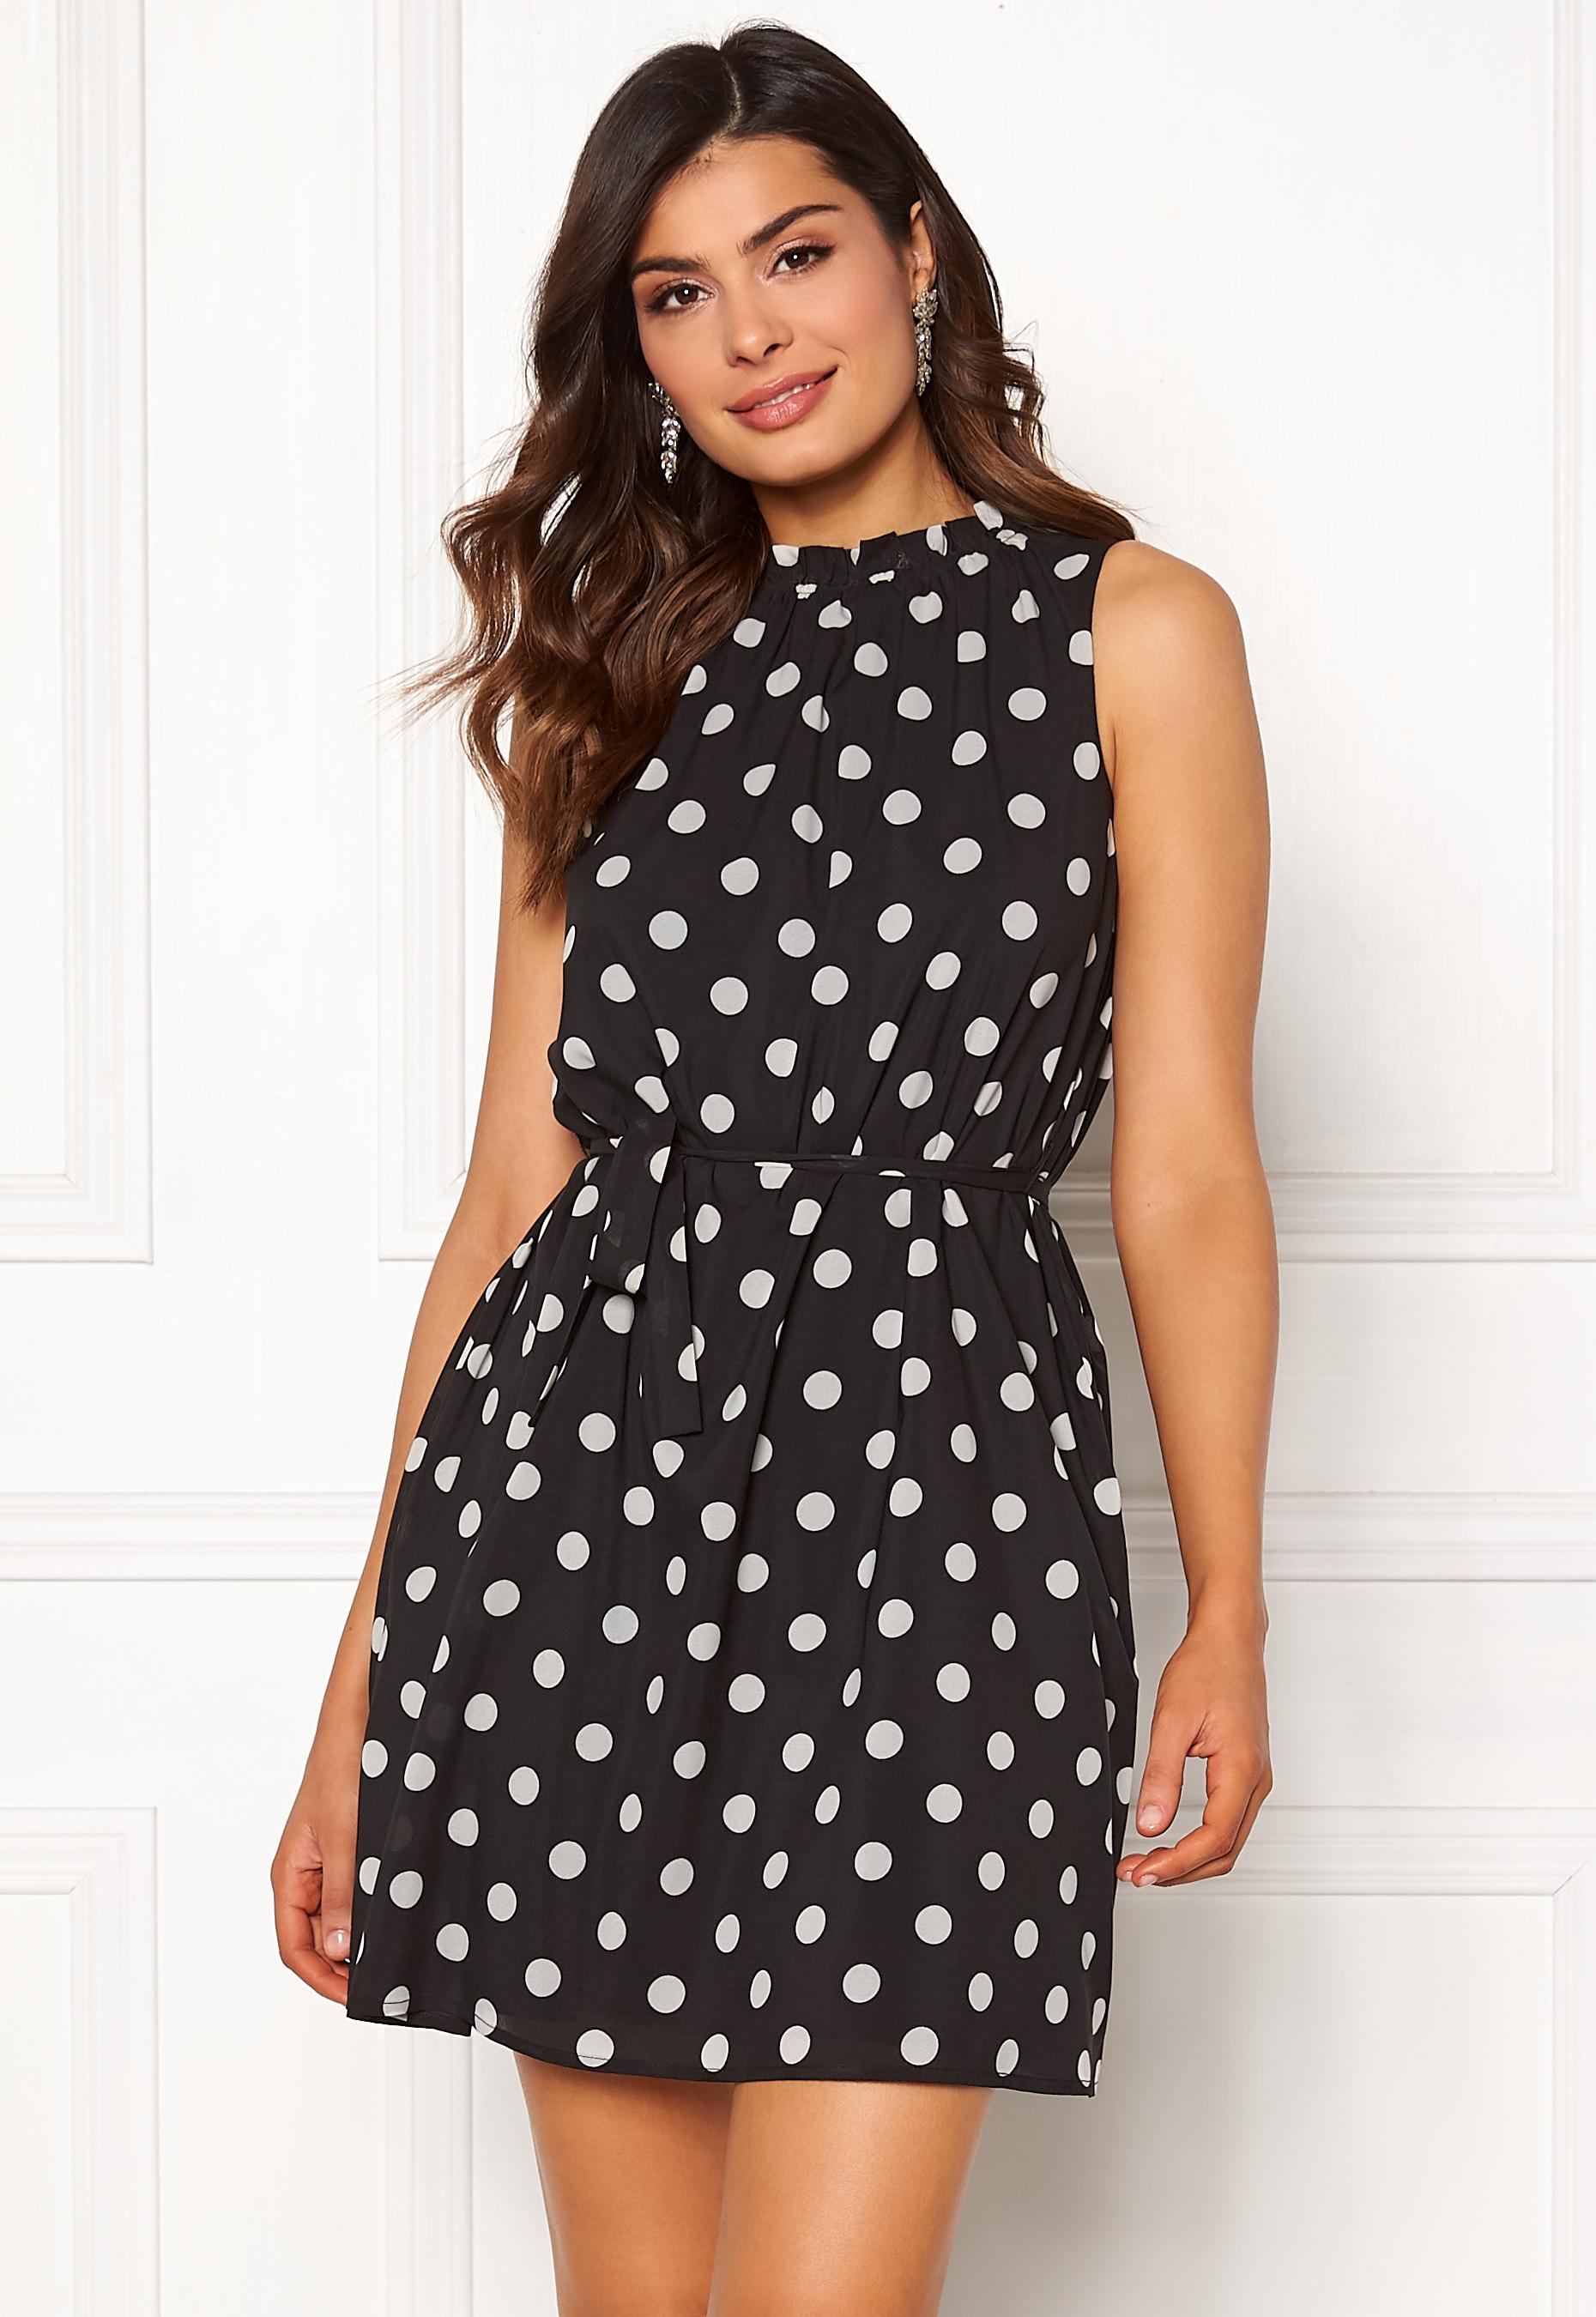 423f8b63 Chiara Forthi Caruso dress Black / White - Bubbleroom